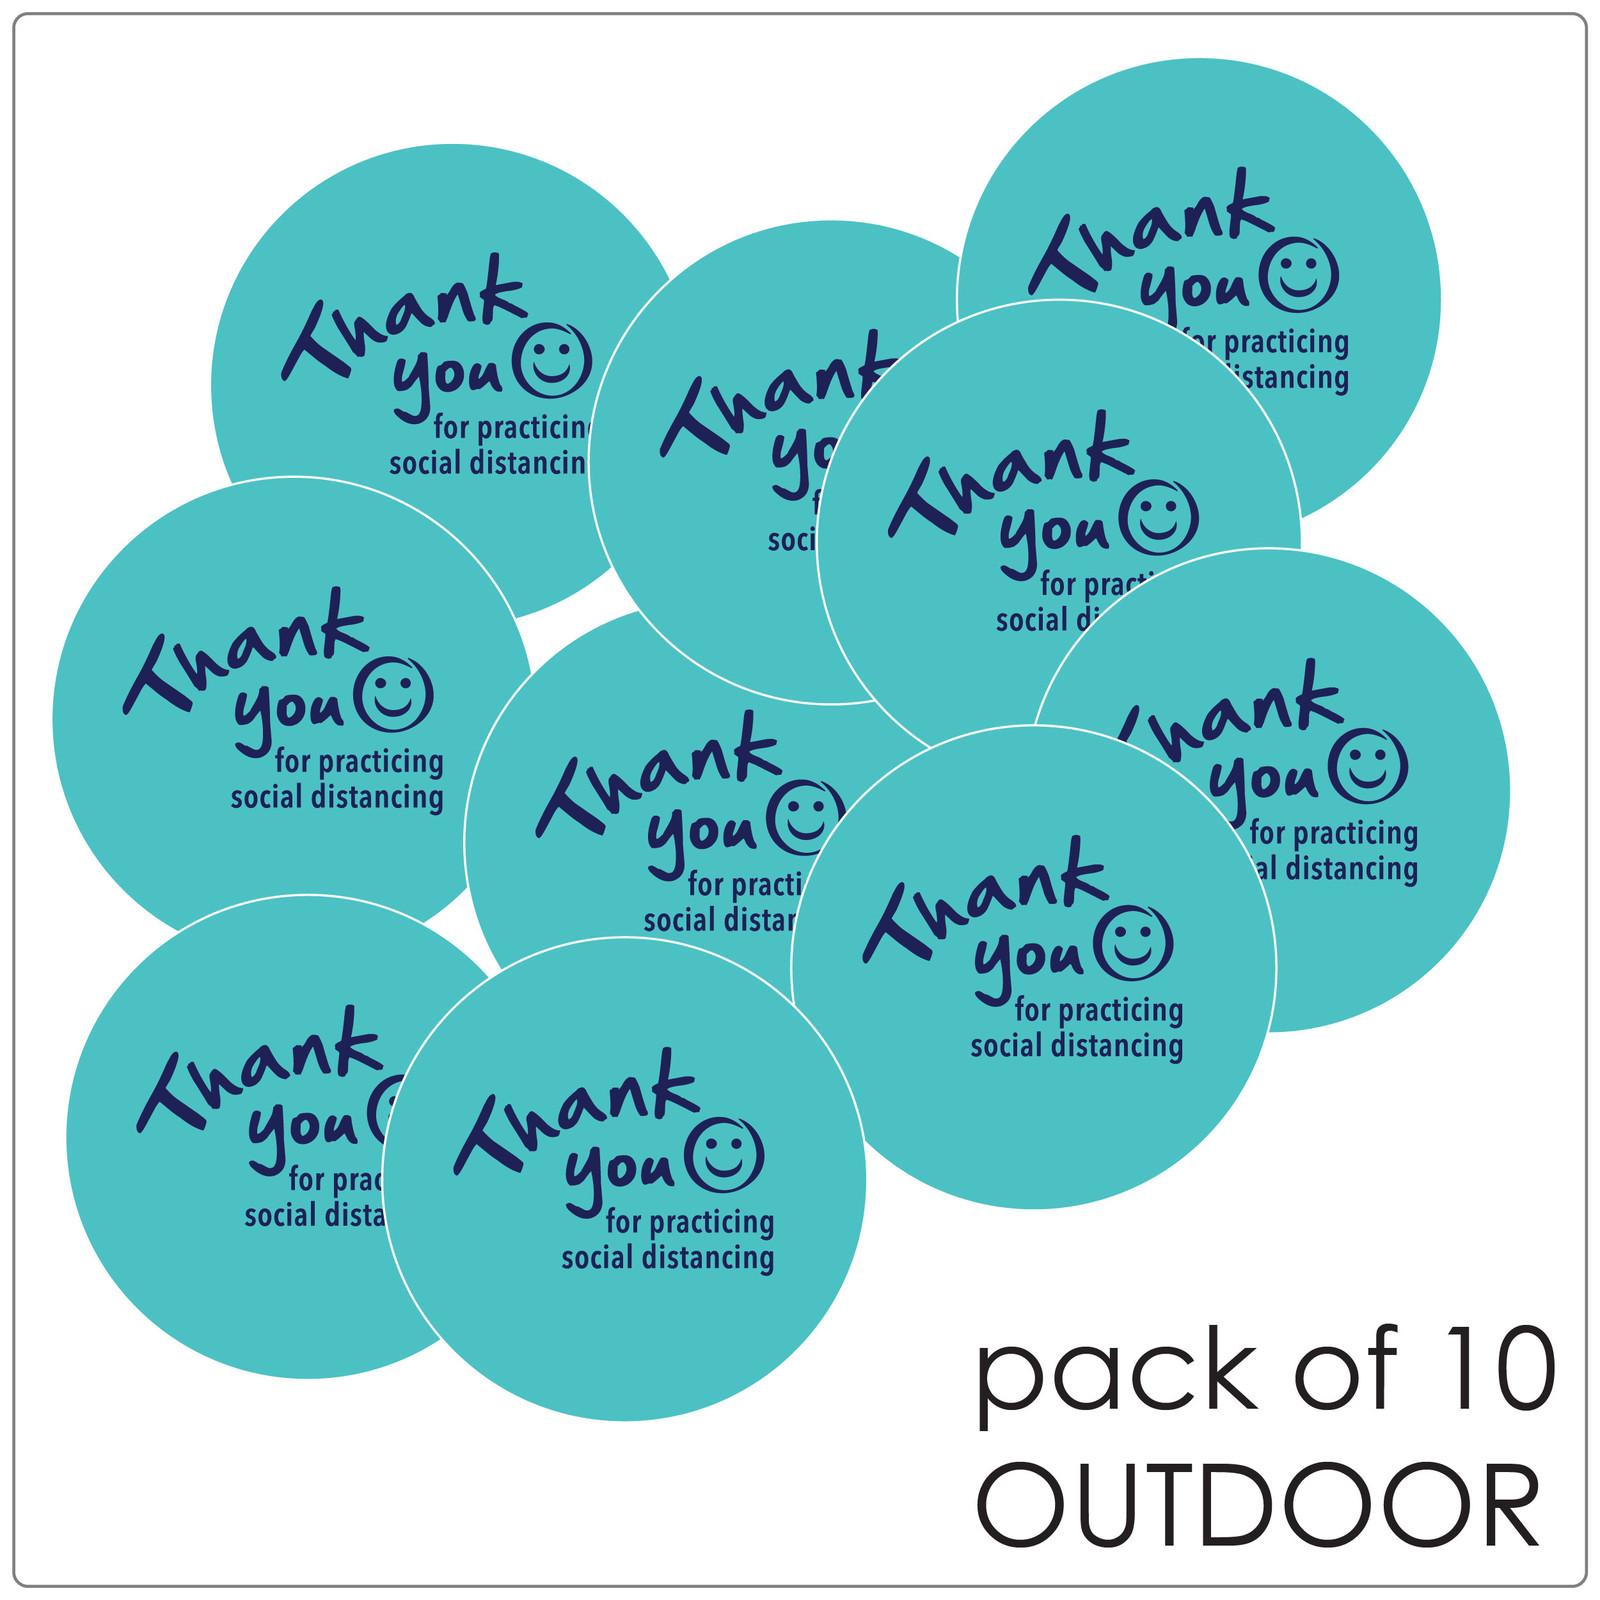 social distancing floor sticker for outdoor floors, teal, pack of 10 Self-adhesive Corona virus floor sticker to help social distancing.